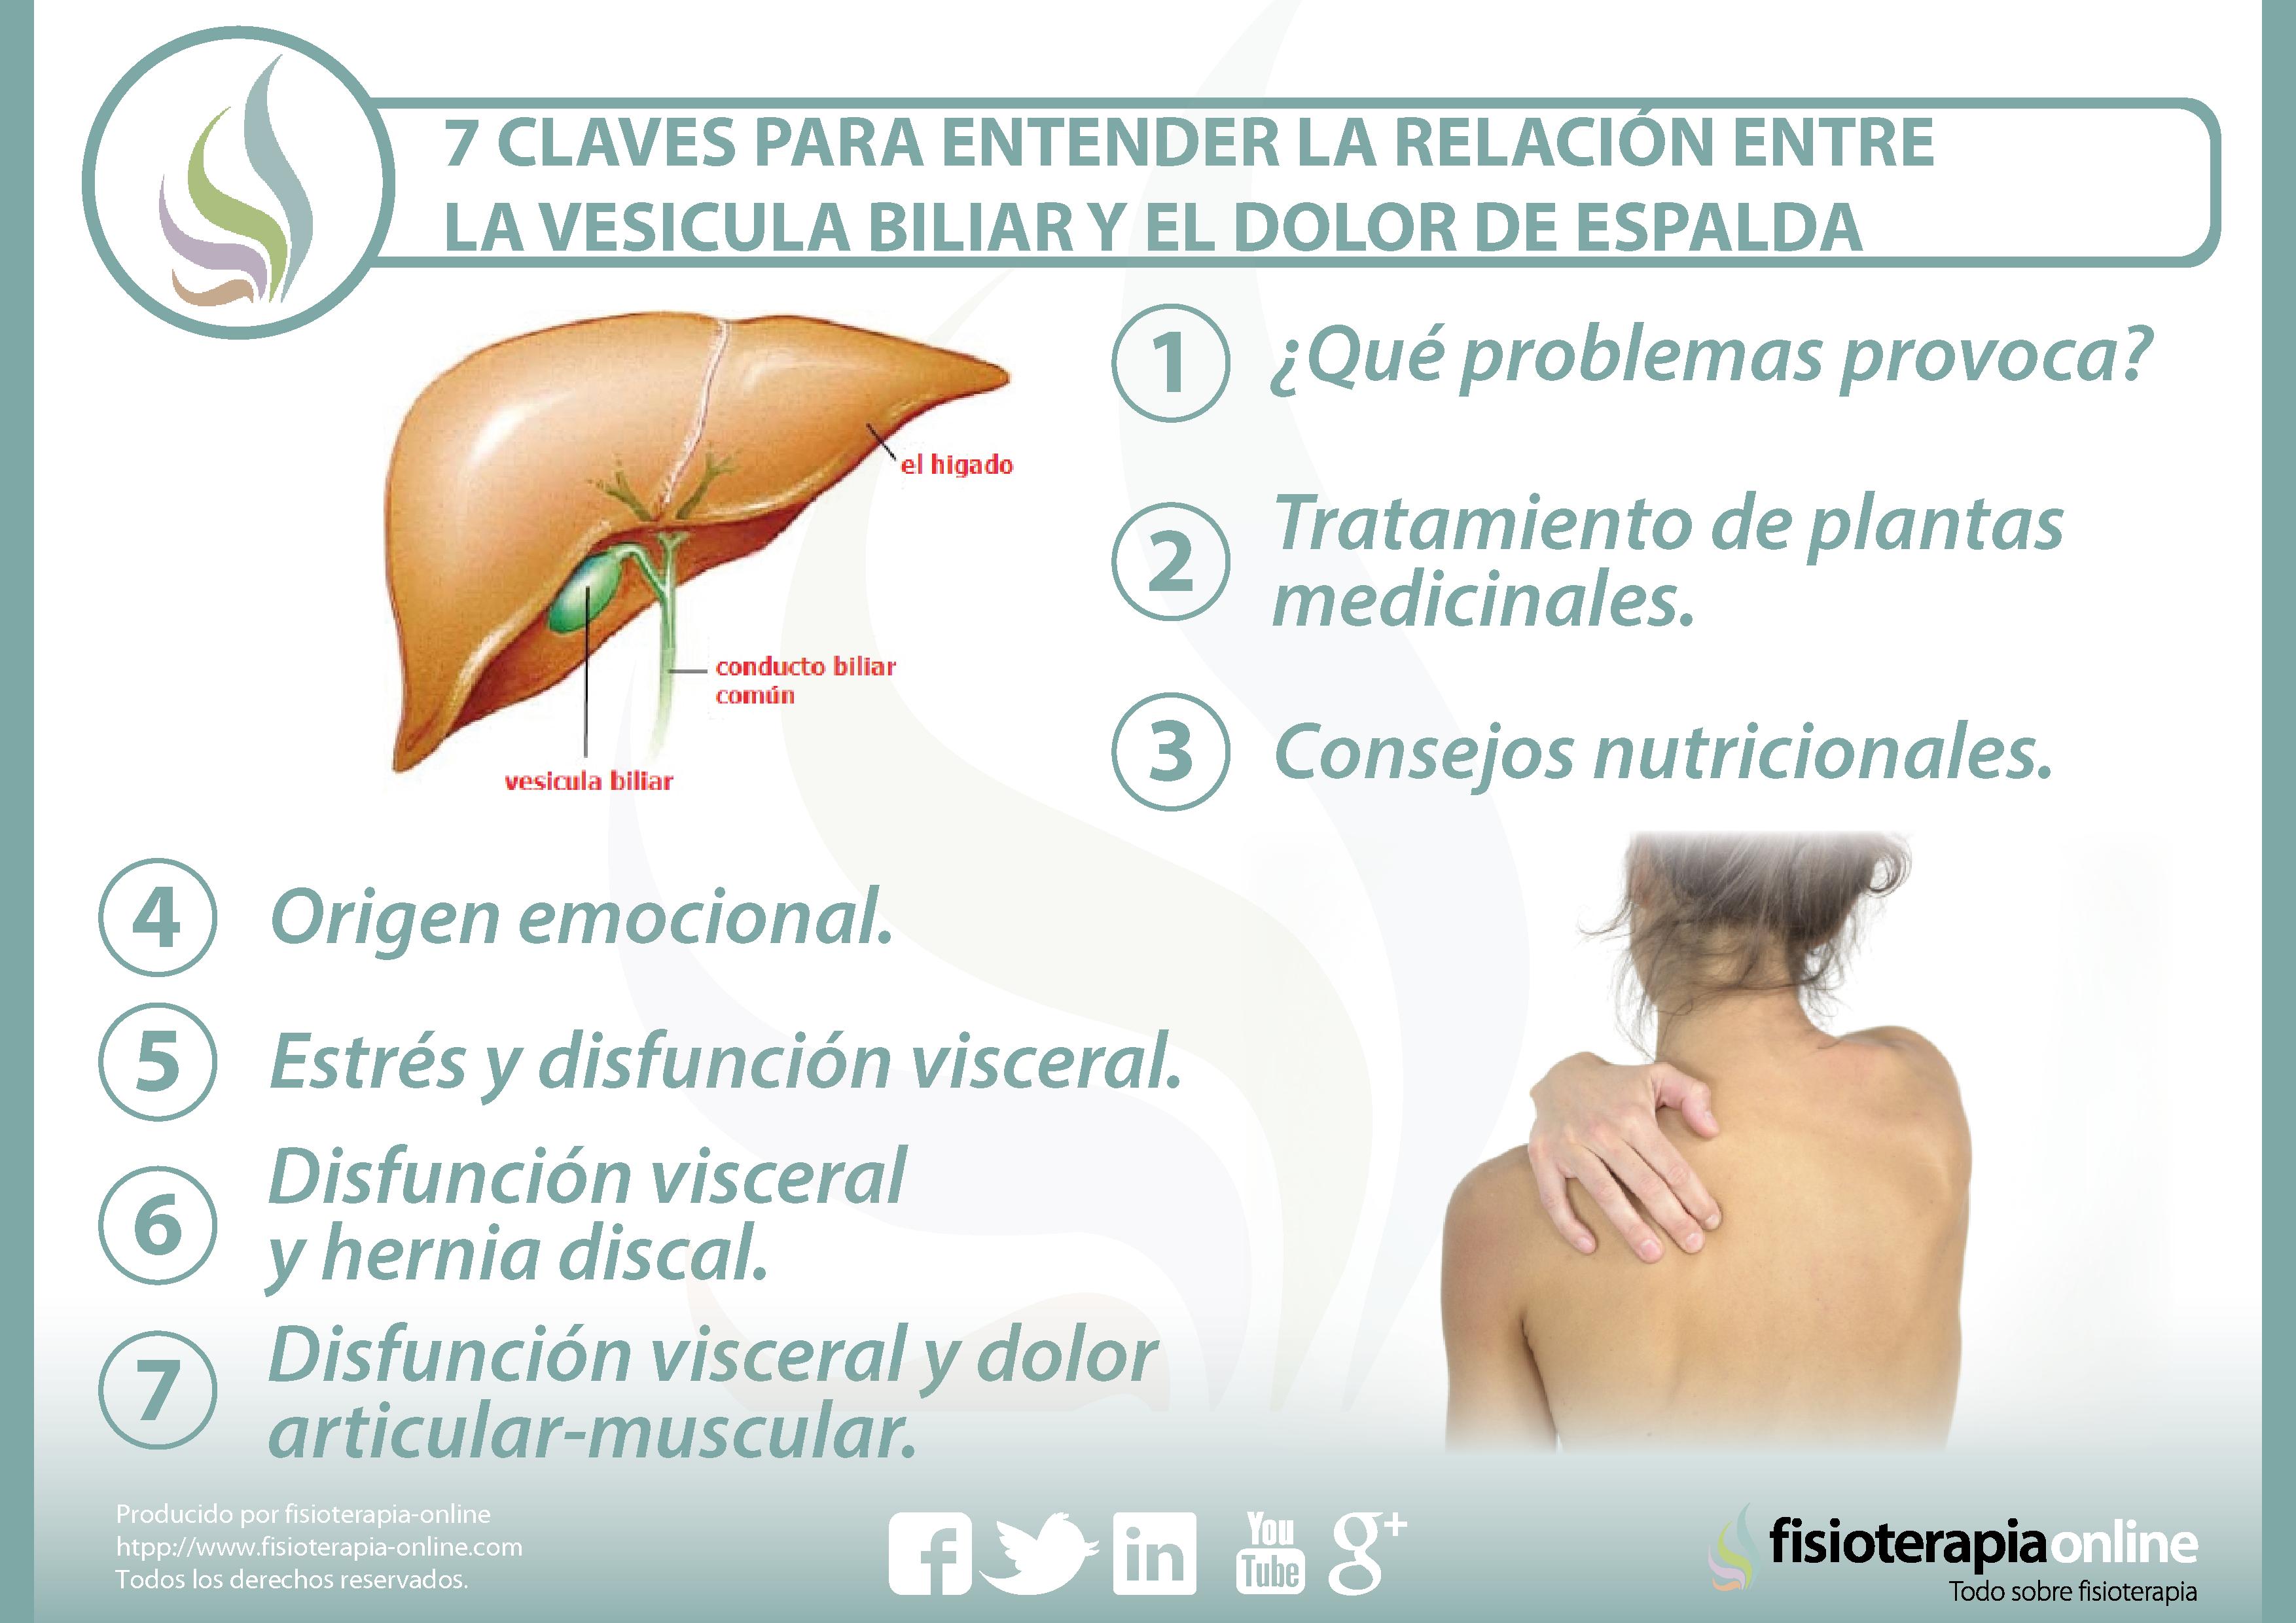 la prostata produce dolor de espalda